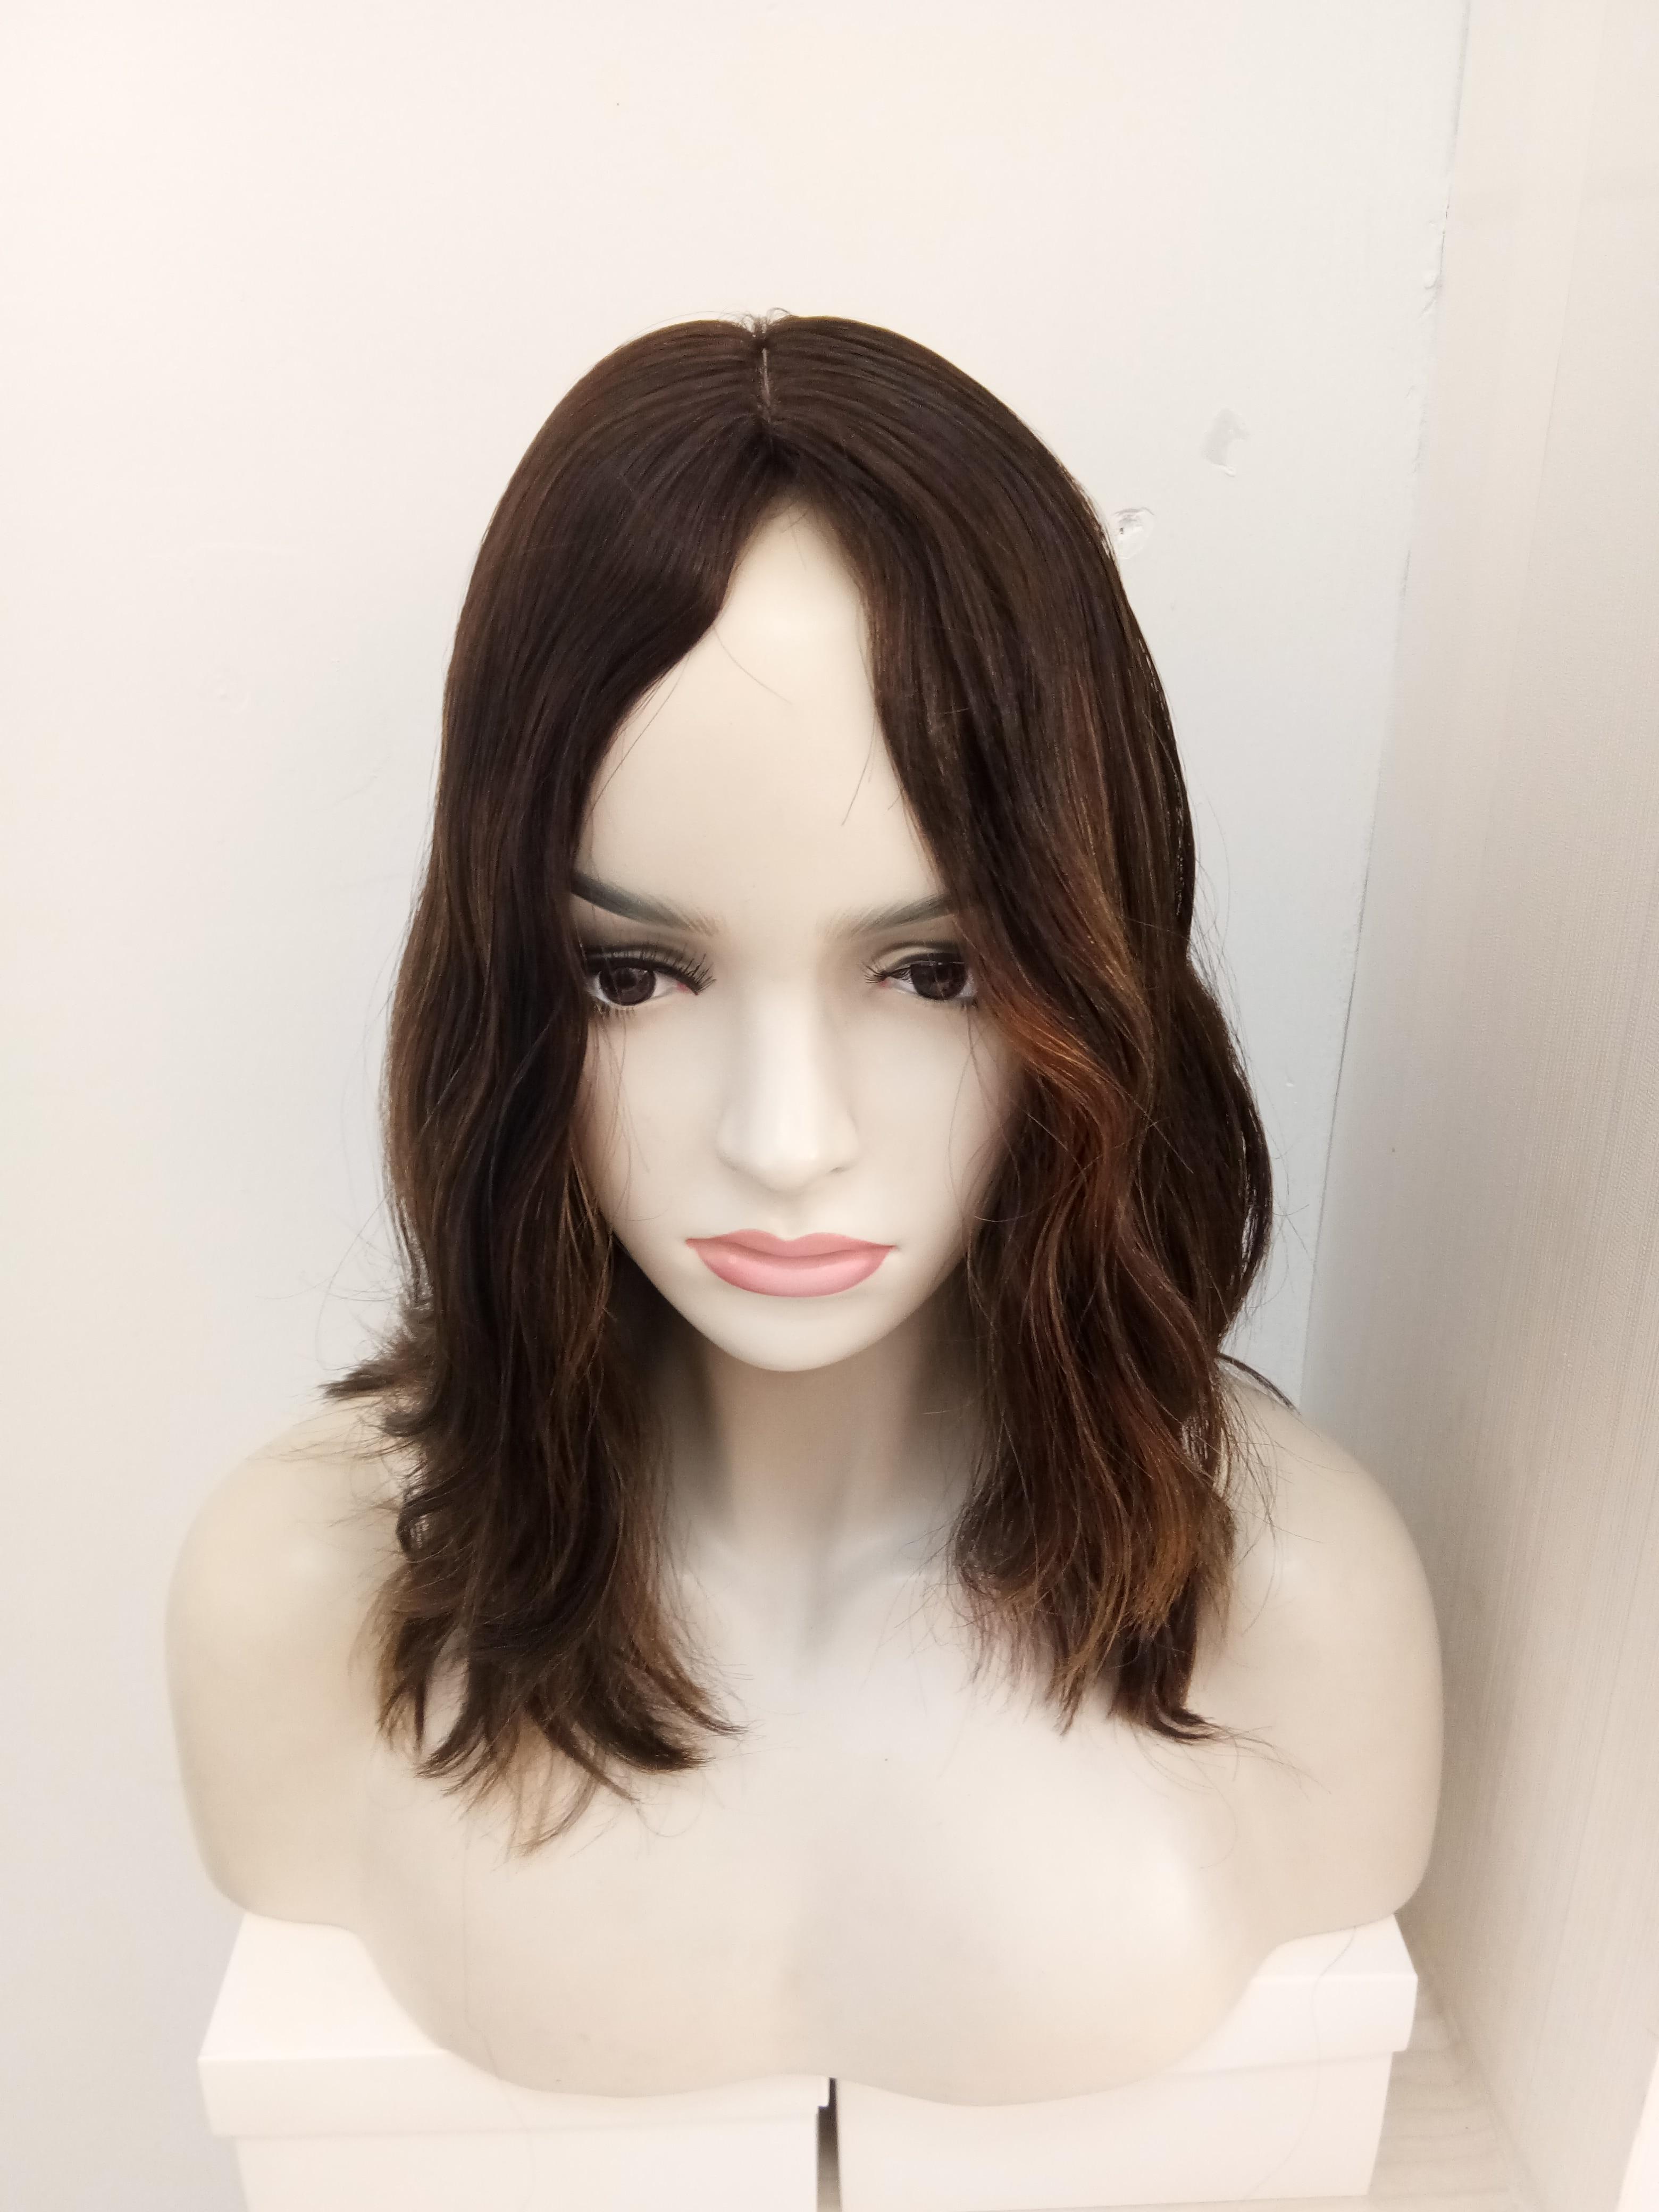 Tsingtaowigs Custom made   European virgin hair unprocessed hair wavy jewish wig   Best Sheitels wigs free shipping